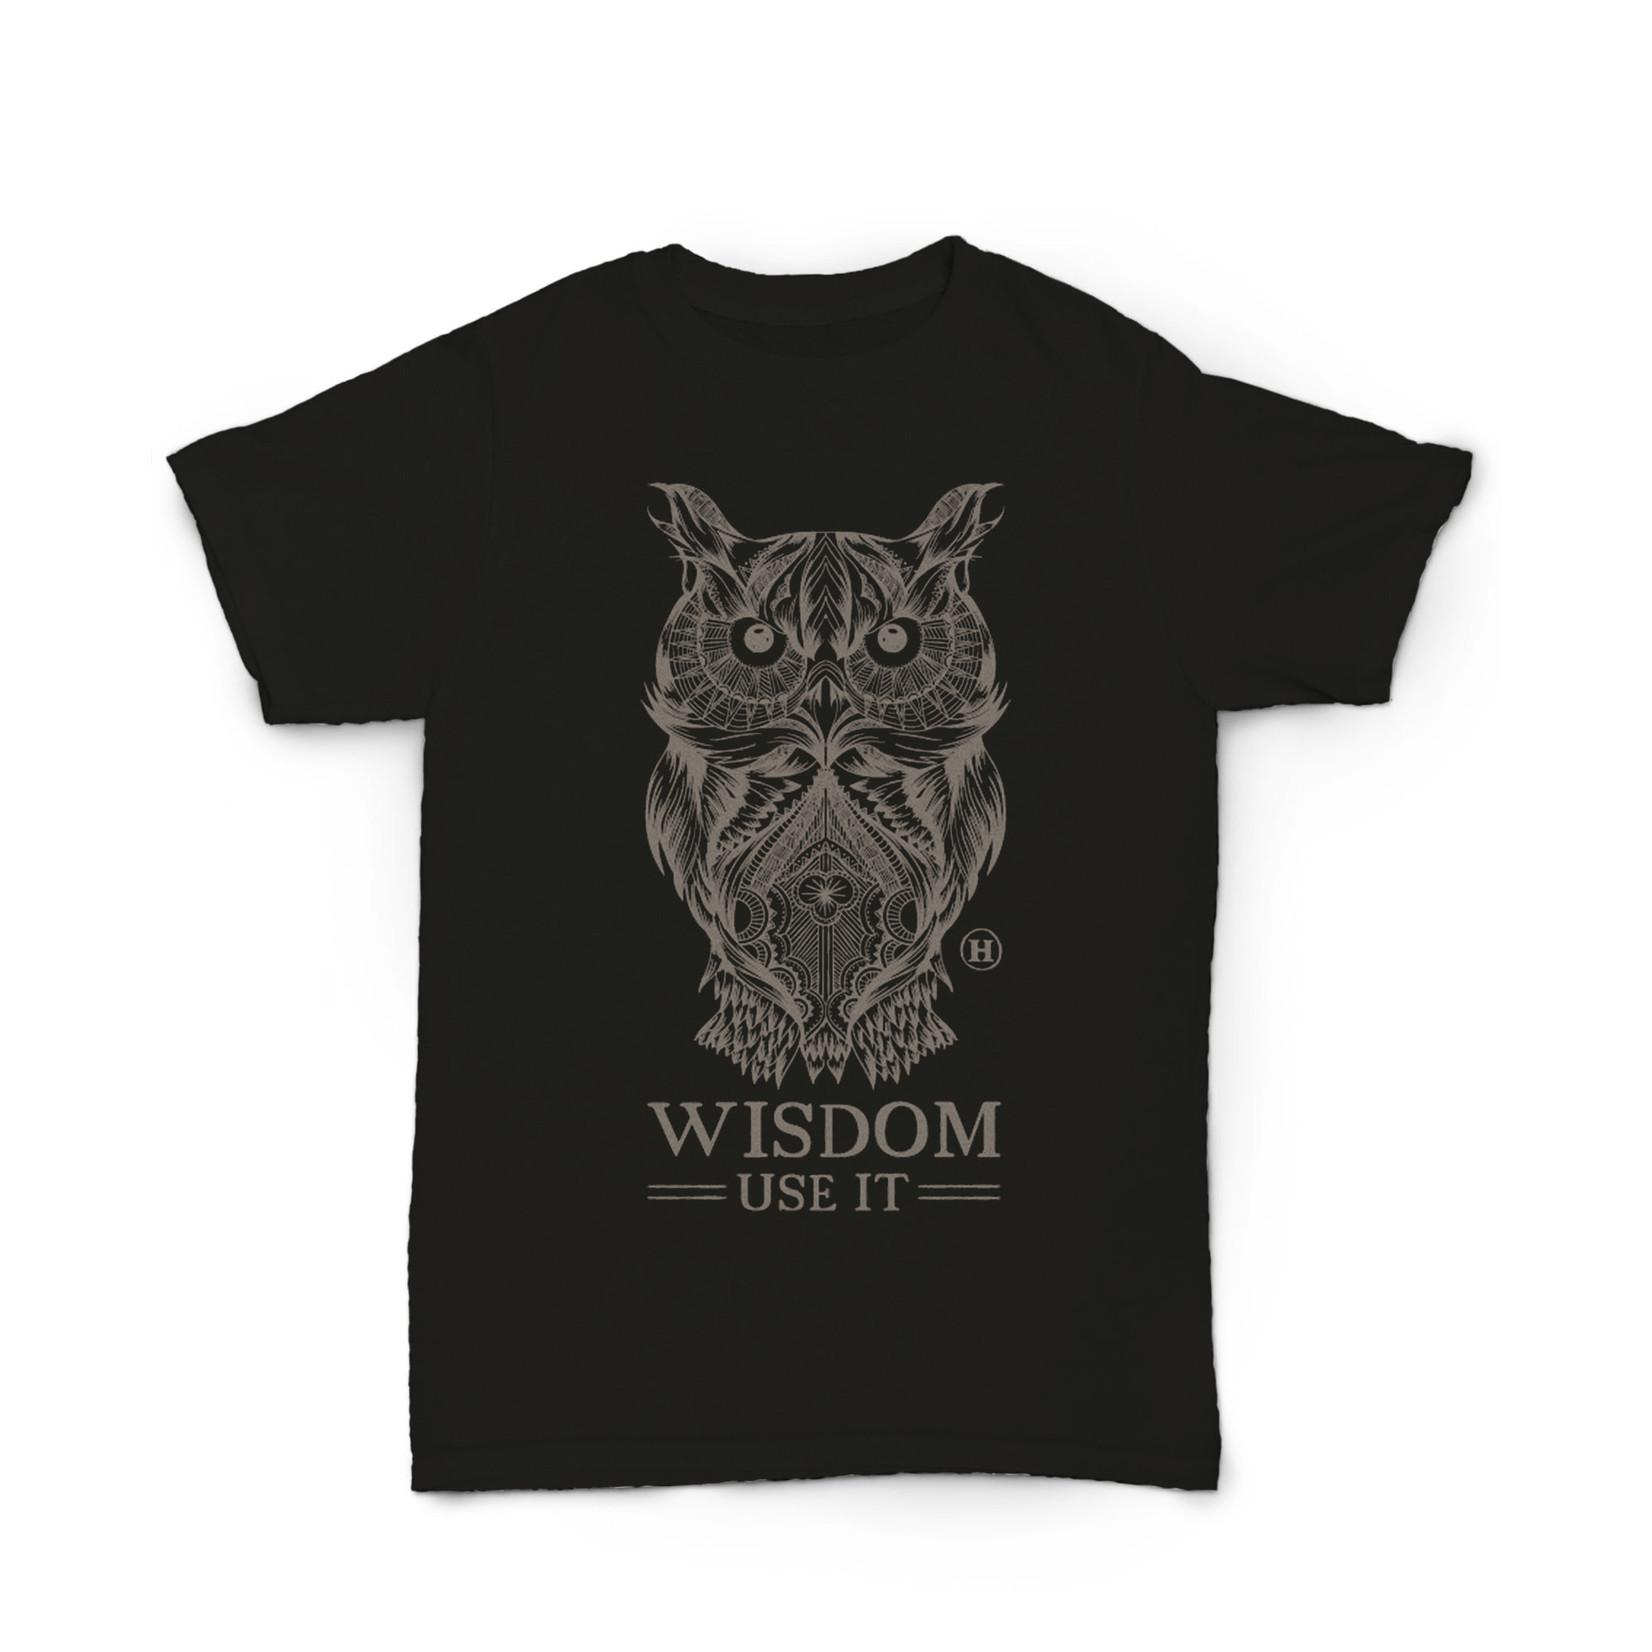 Hempy's Hemp T Shirt Totem Owl Series Black